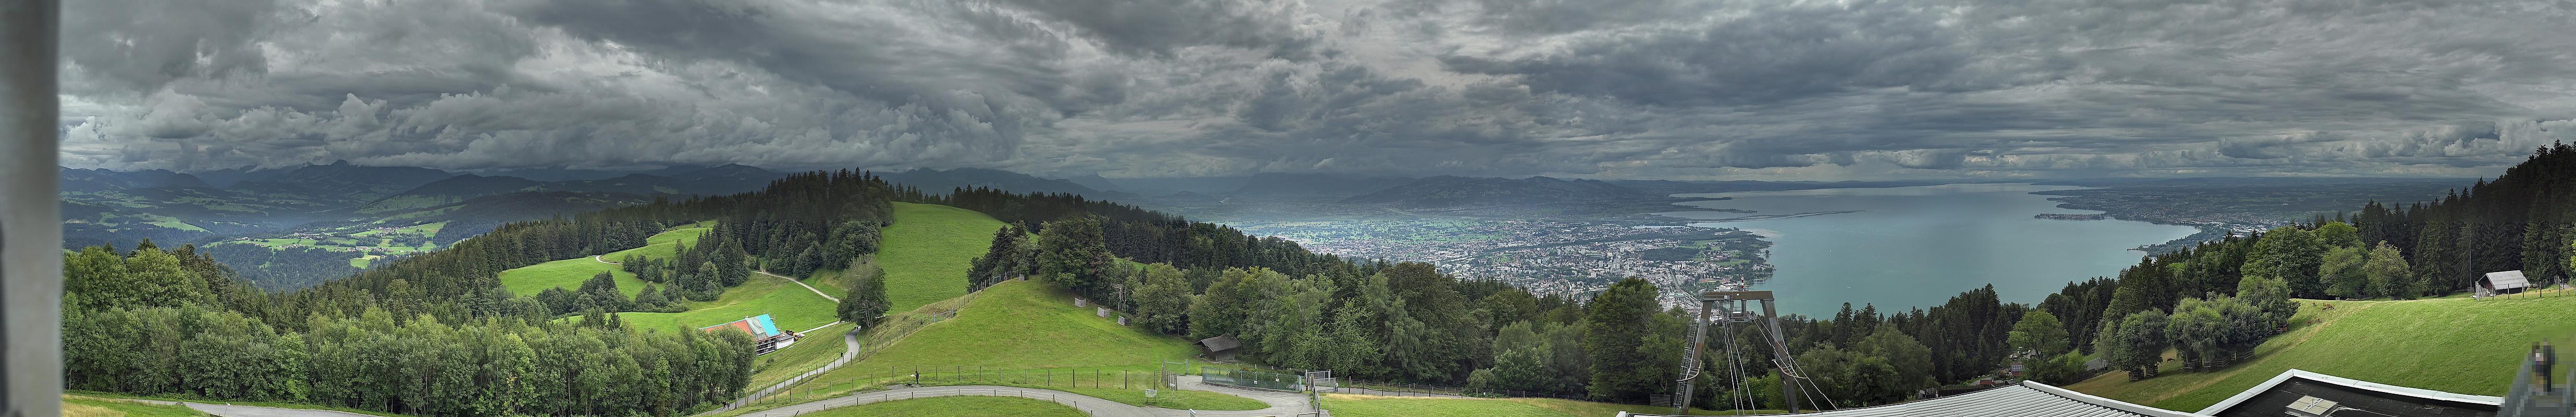 Pfänder (View from Bergstation)